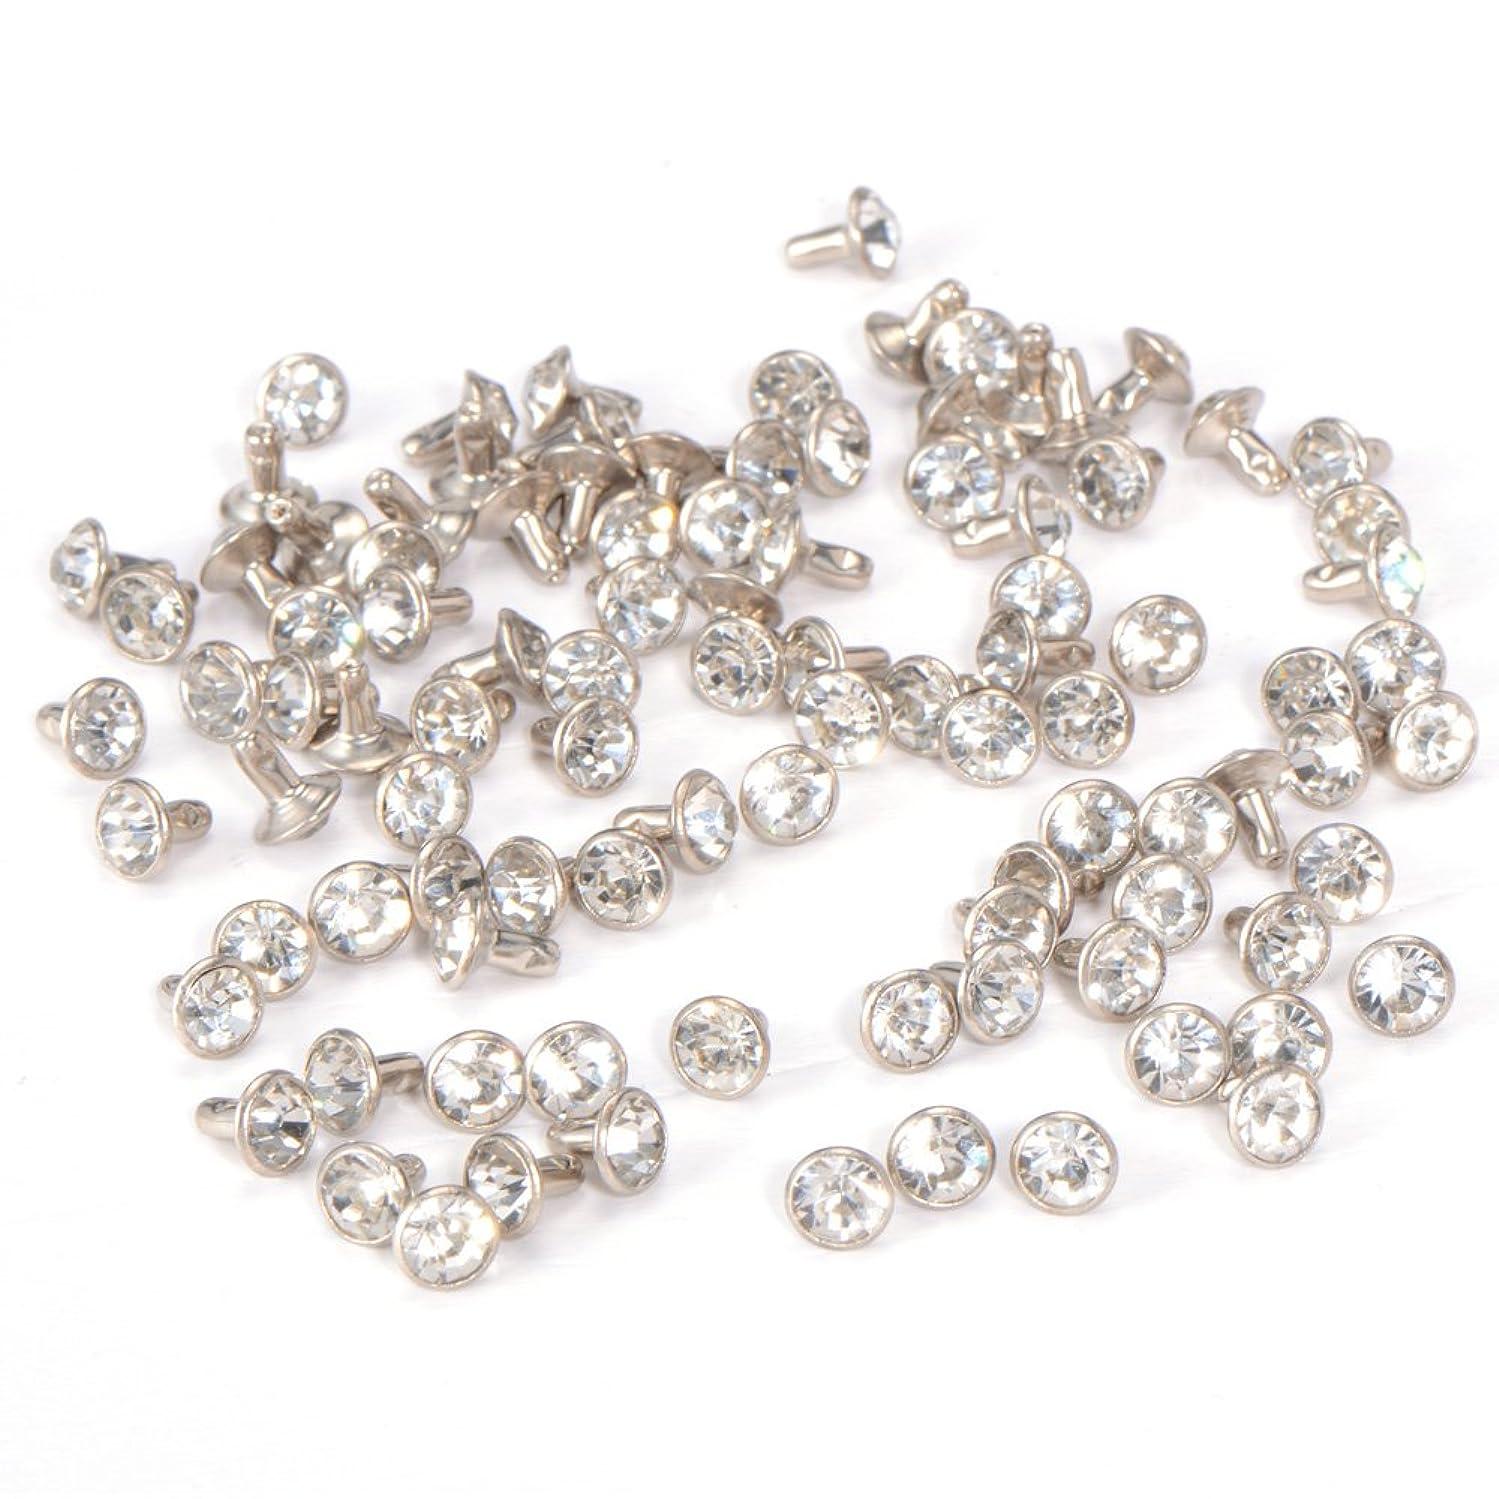 100pcs 7mm Diamante Diamond Clear Silver Crystal RIVET STUDS PUNK